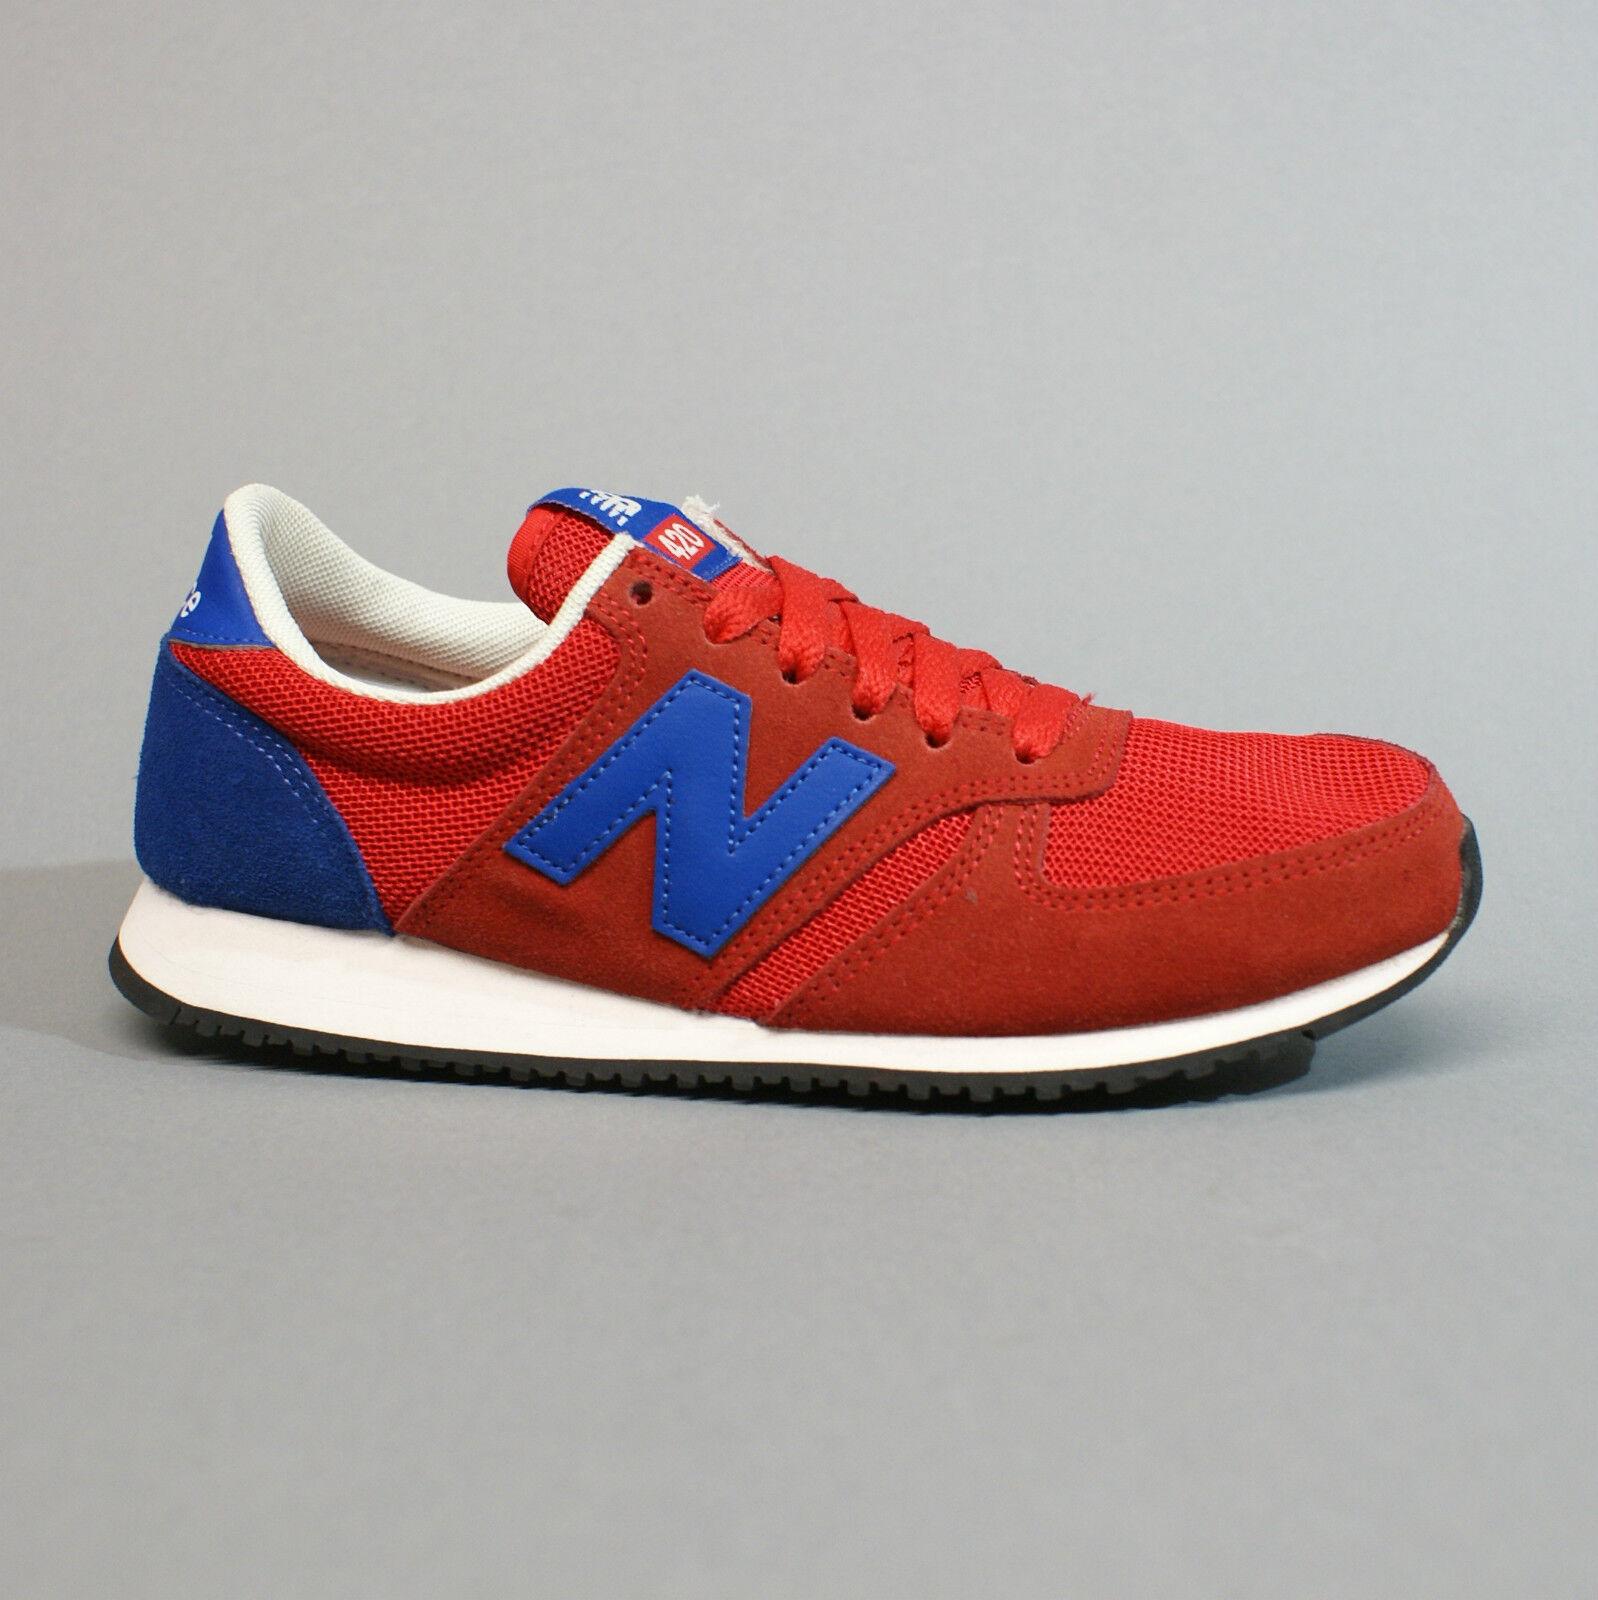 NEU Balance U420SNRR ROT Blau Turnschuhe Sneaker rot blau 36  38,5  41,5